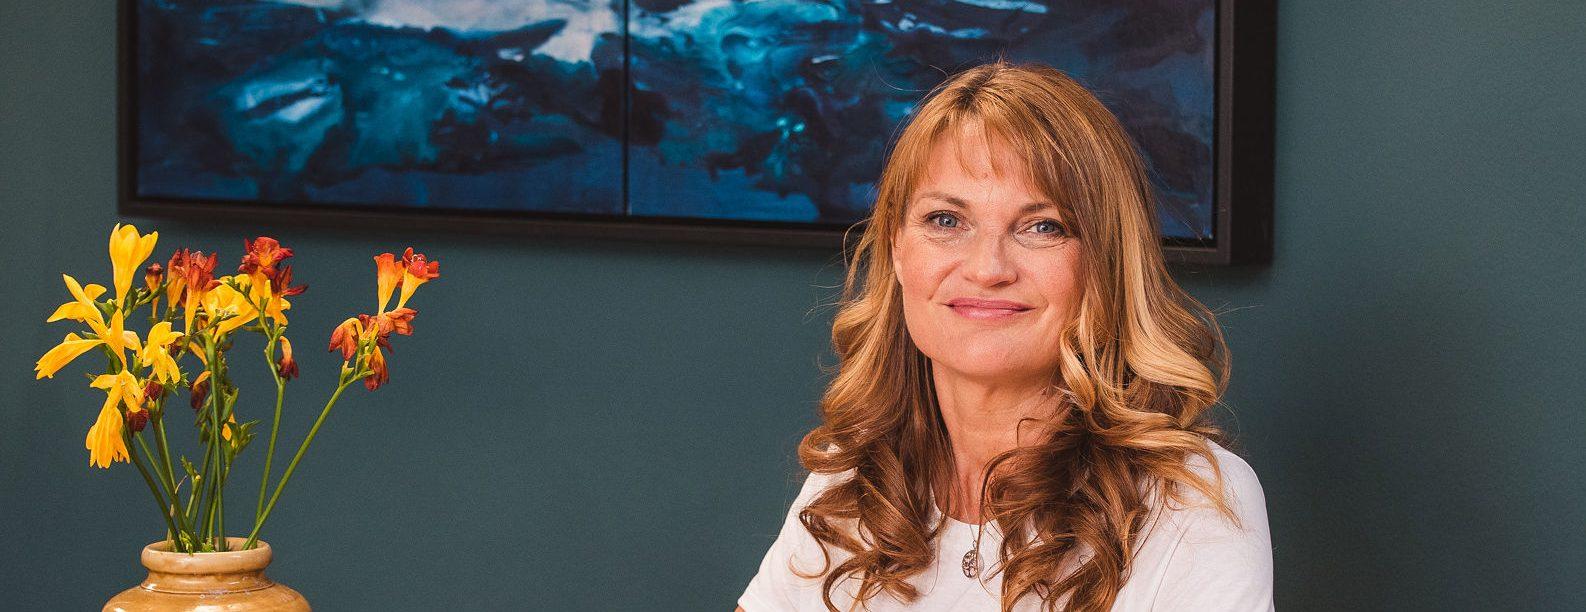 Melanie Cook Hypnotherapy